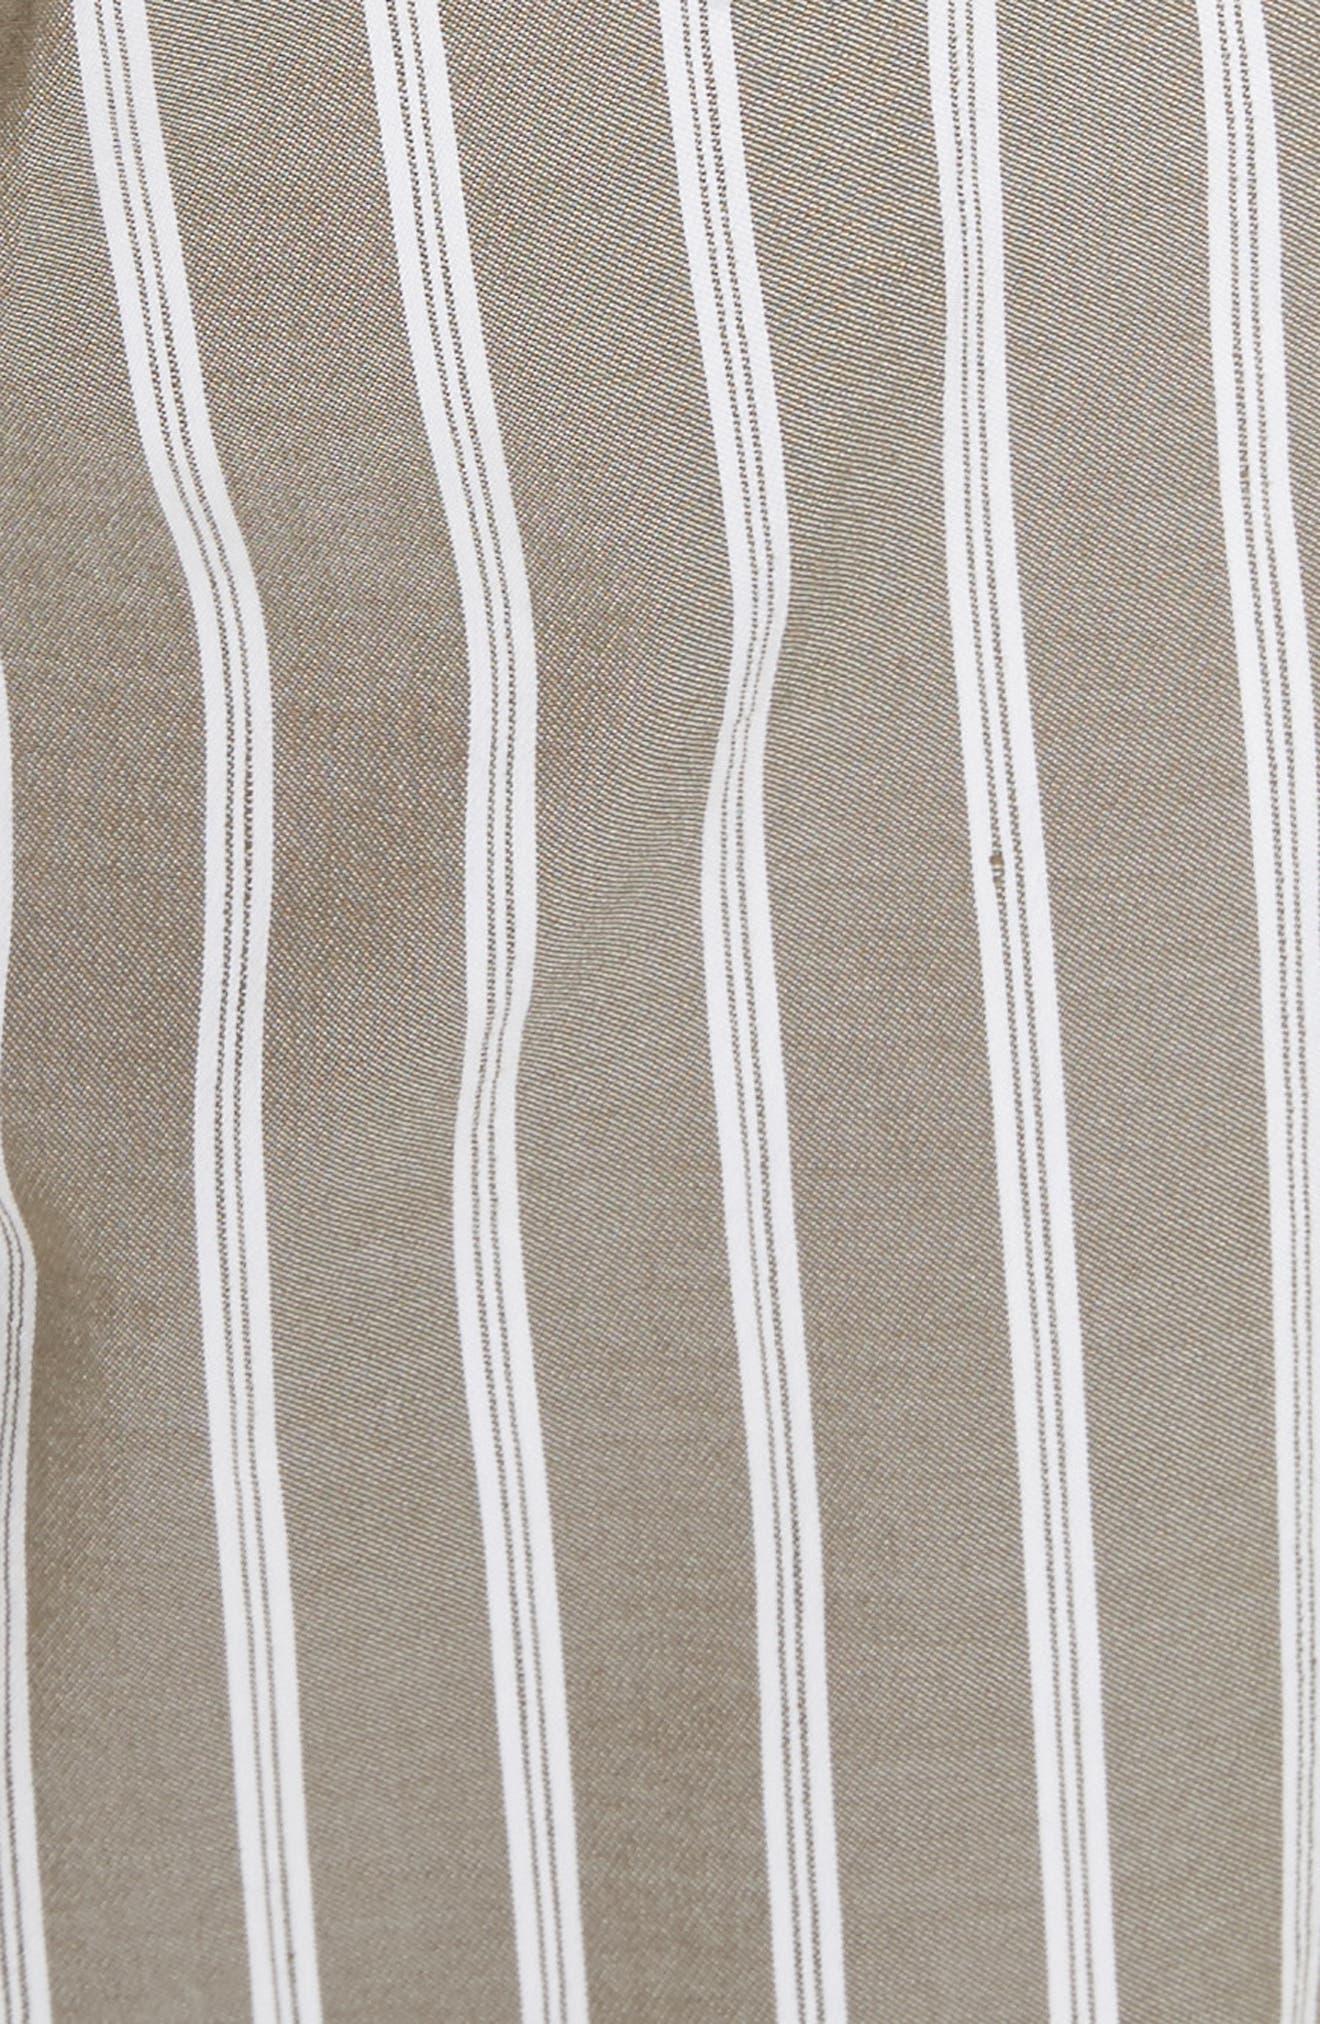 Fulton Desert Stripe Cotton & Linen Pants,                             Alternate thumbnail 5, color,